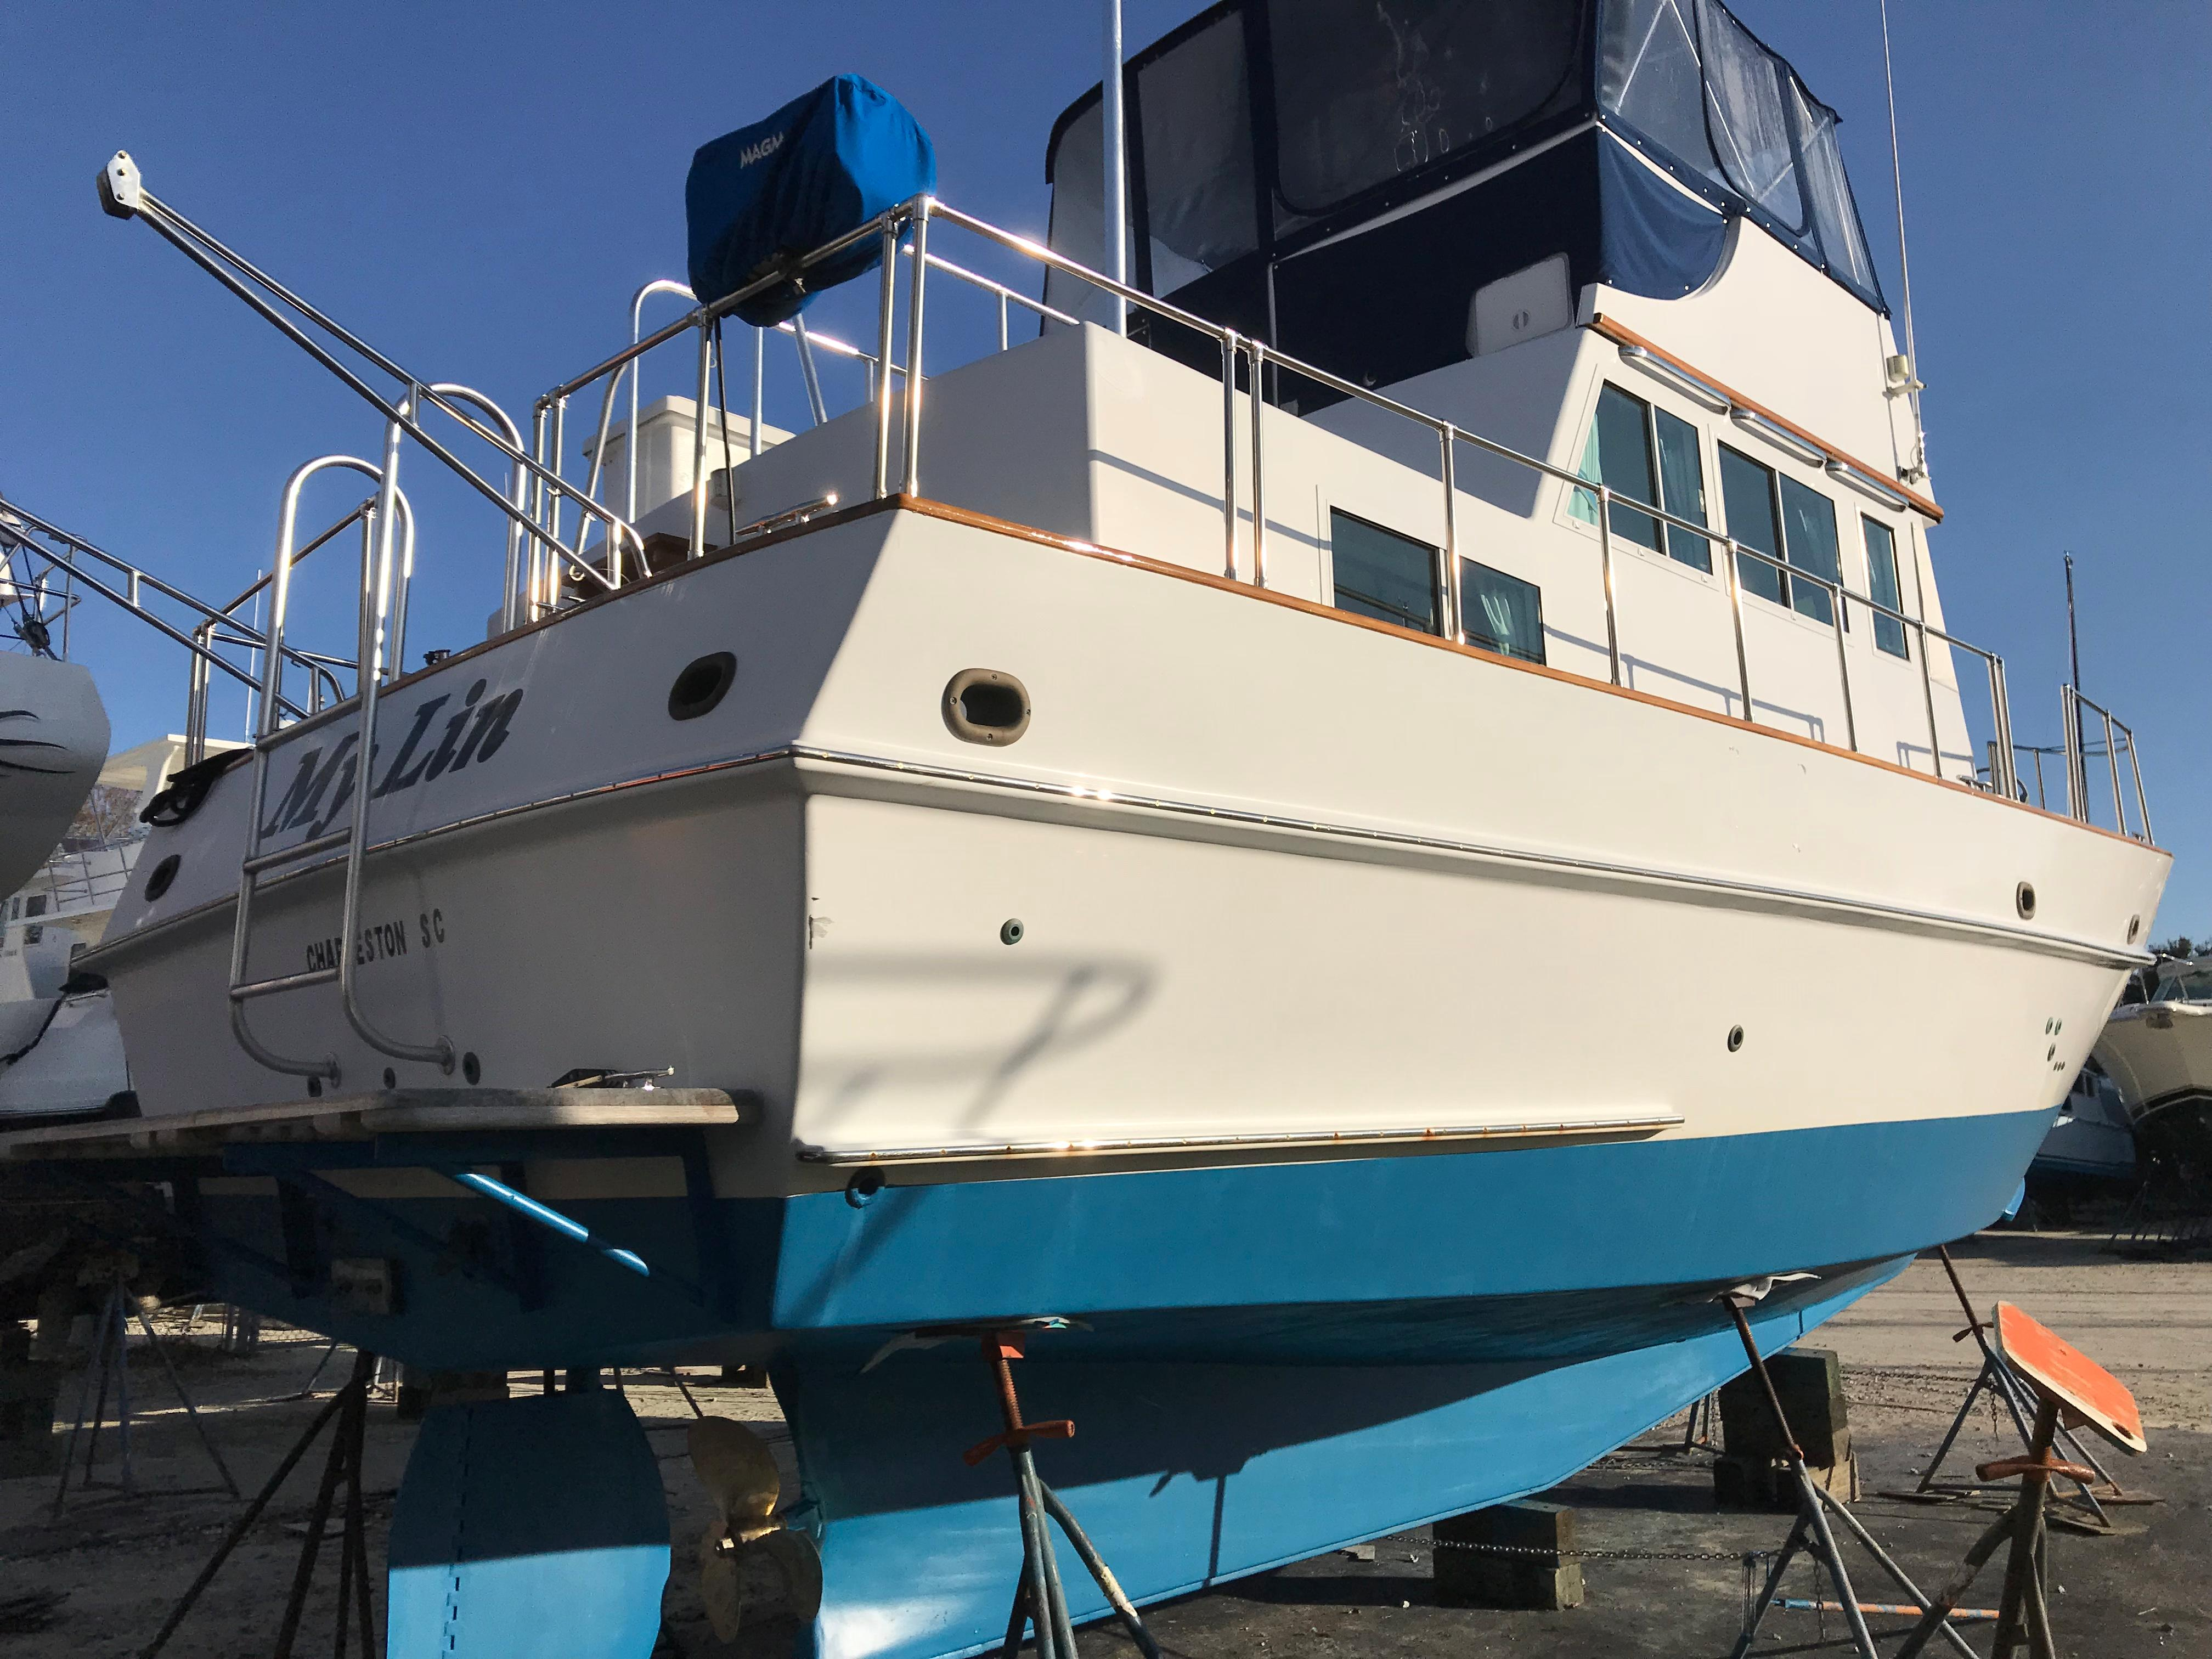 Custom 36 Yukon Trawler - Aft Shot on the hard